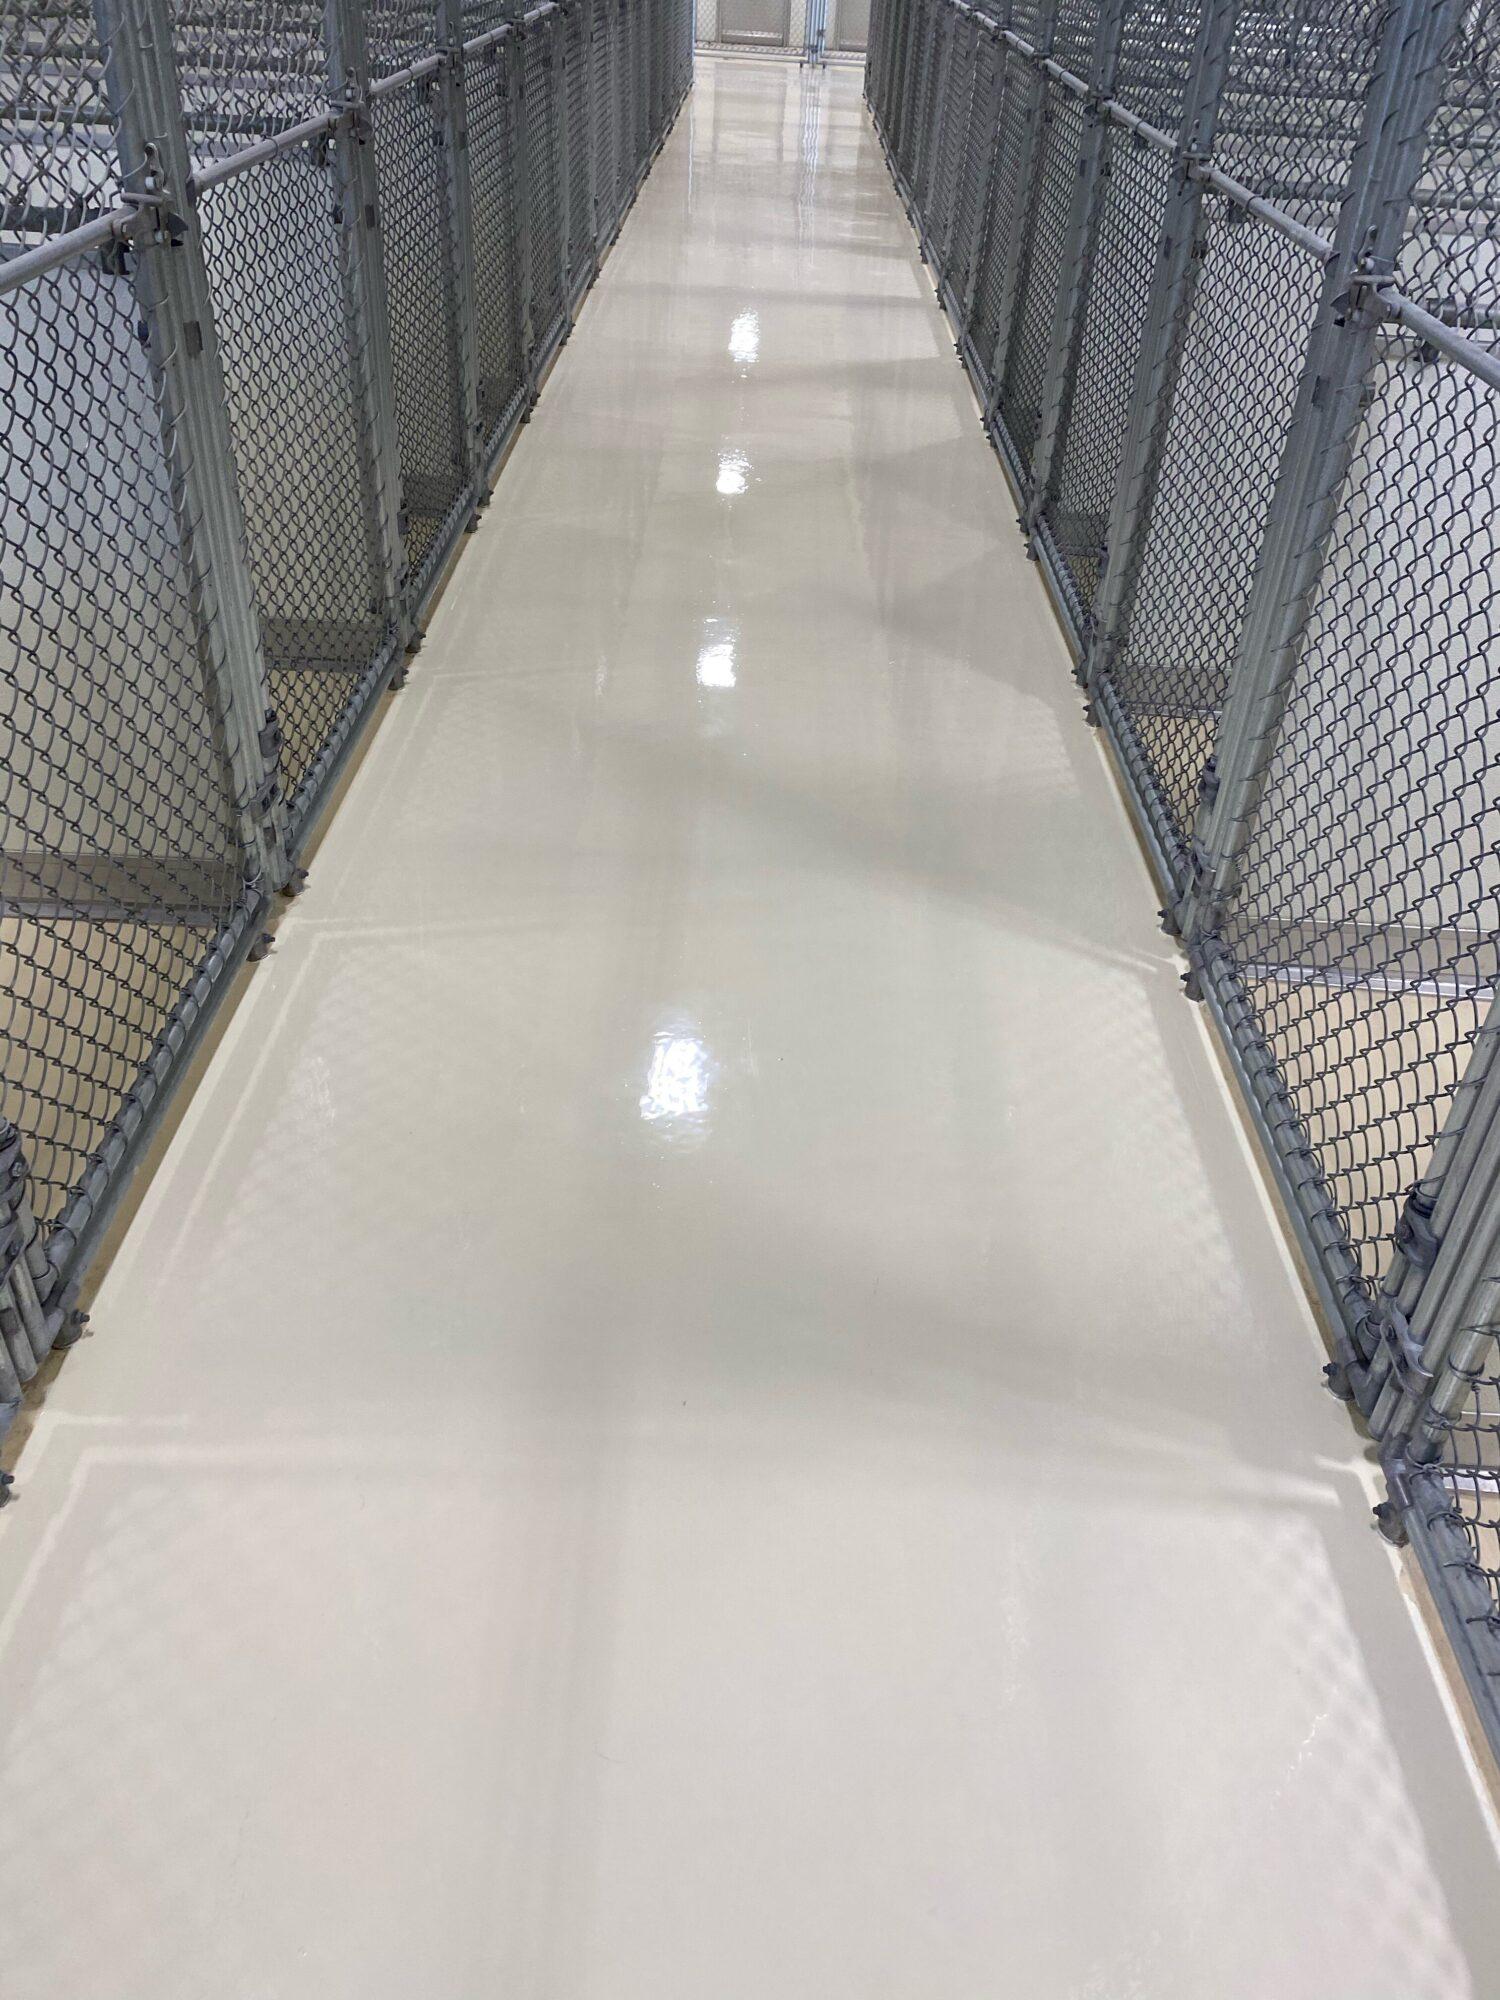 Concrete floor coatings, epoxy floor coatings, epoxy coatings, Industrial Applications Inc, TeamIA, epoxy floor coating, kennel epoxy coatings, kennel coatings, veterinary coatings